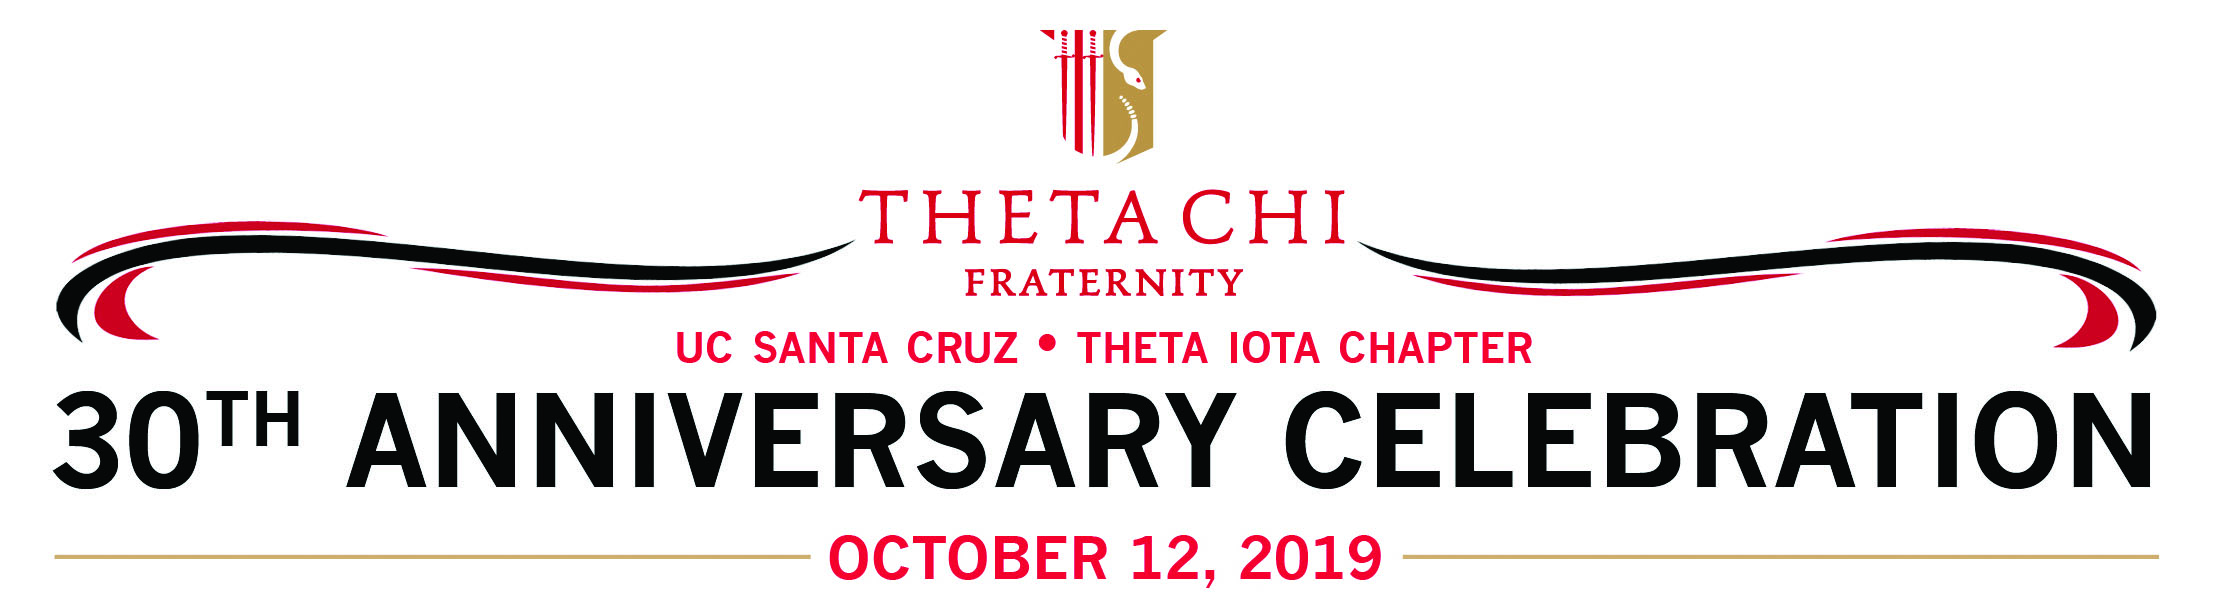 30th Anniversary – Theta Chi Fraternity – UC Santa Cruz